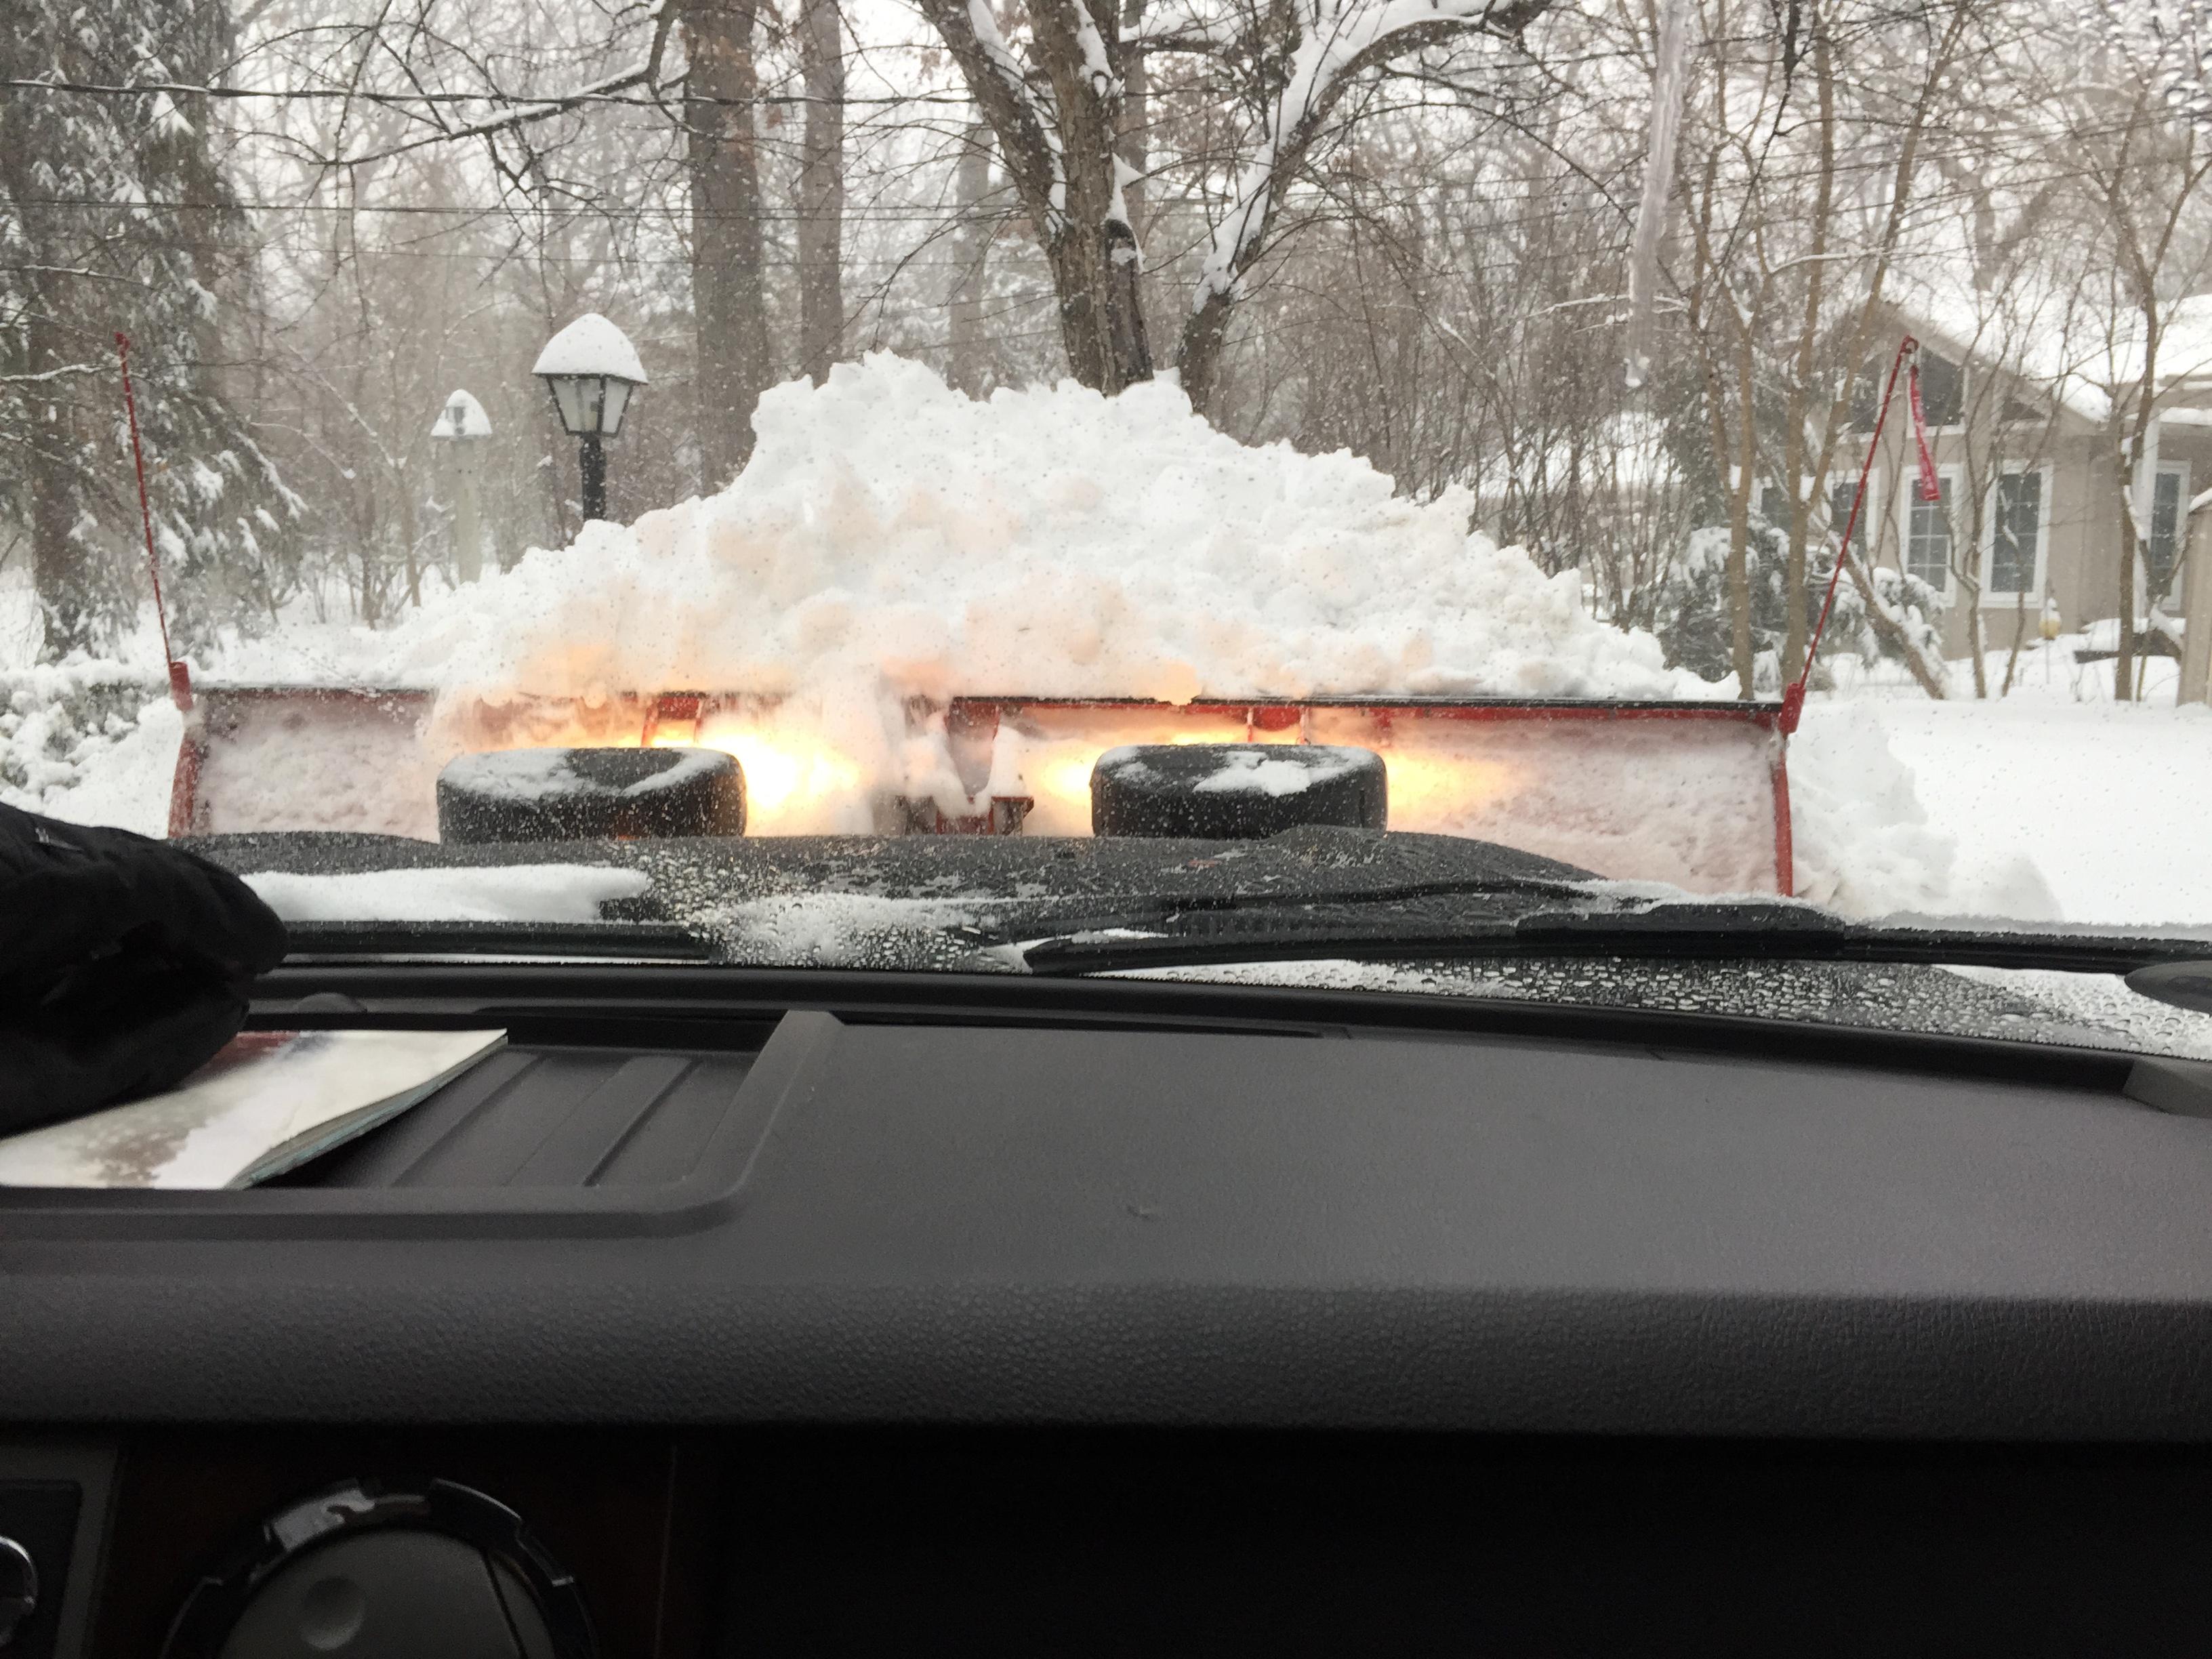 McHenry County Blizzard 2-1-15